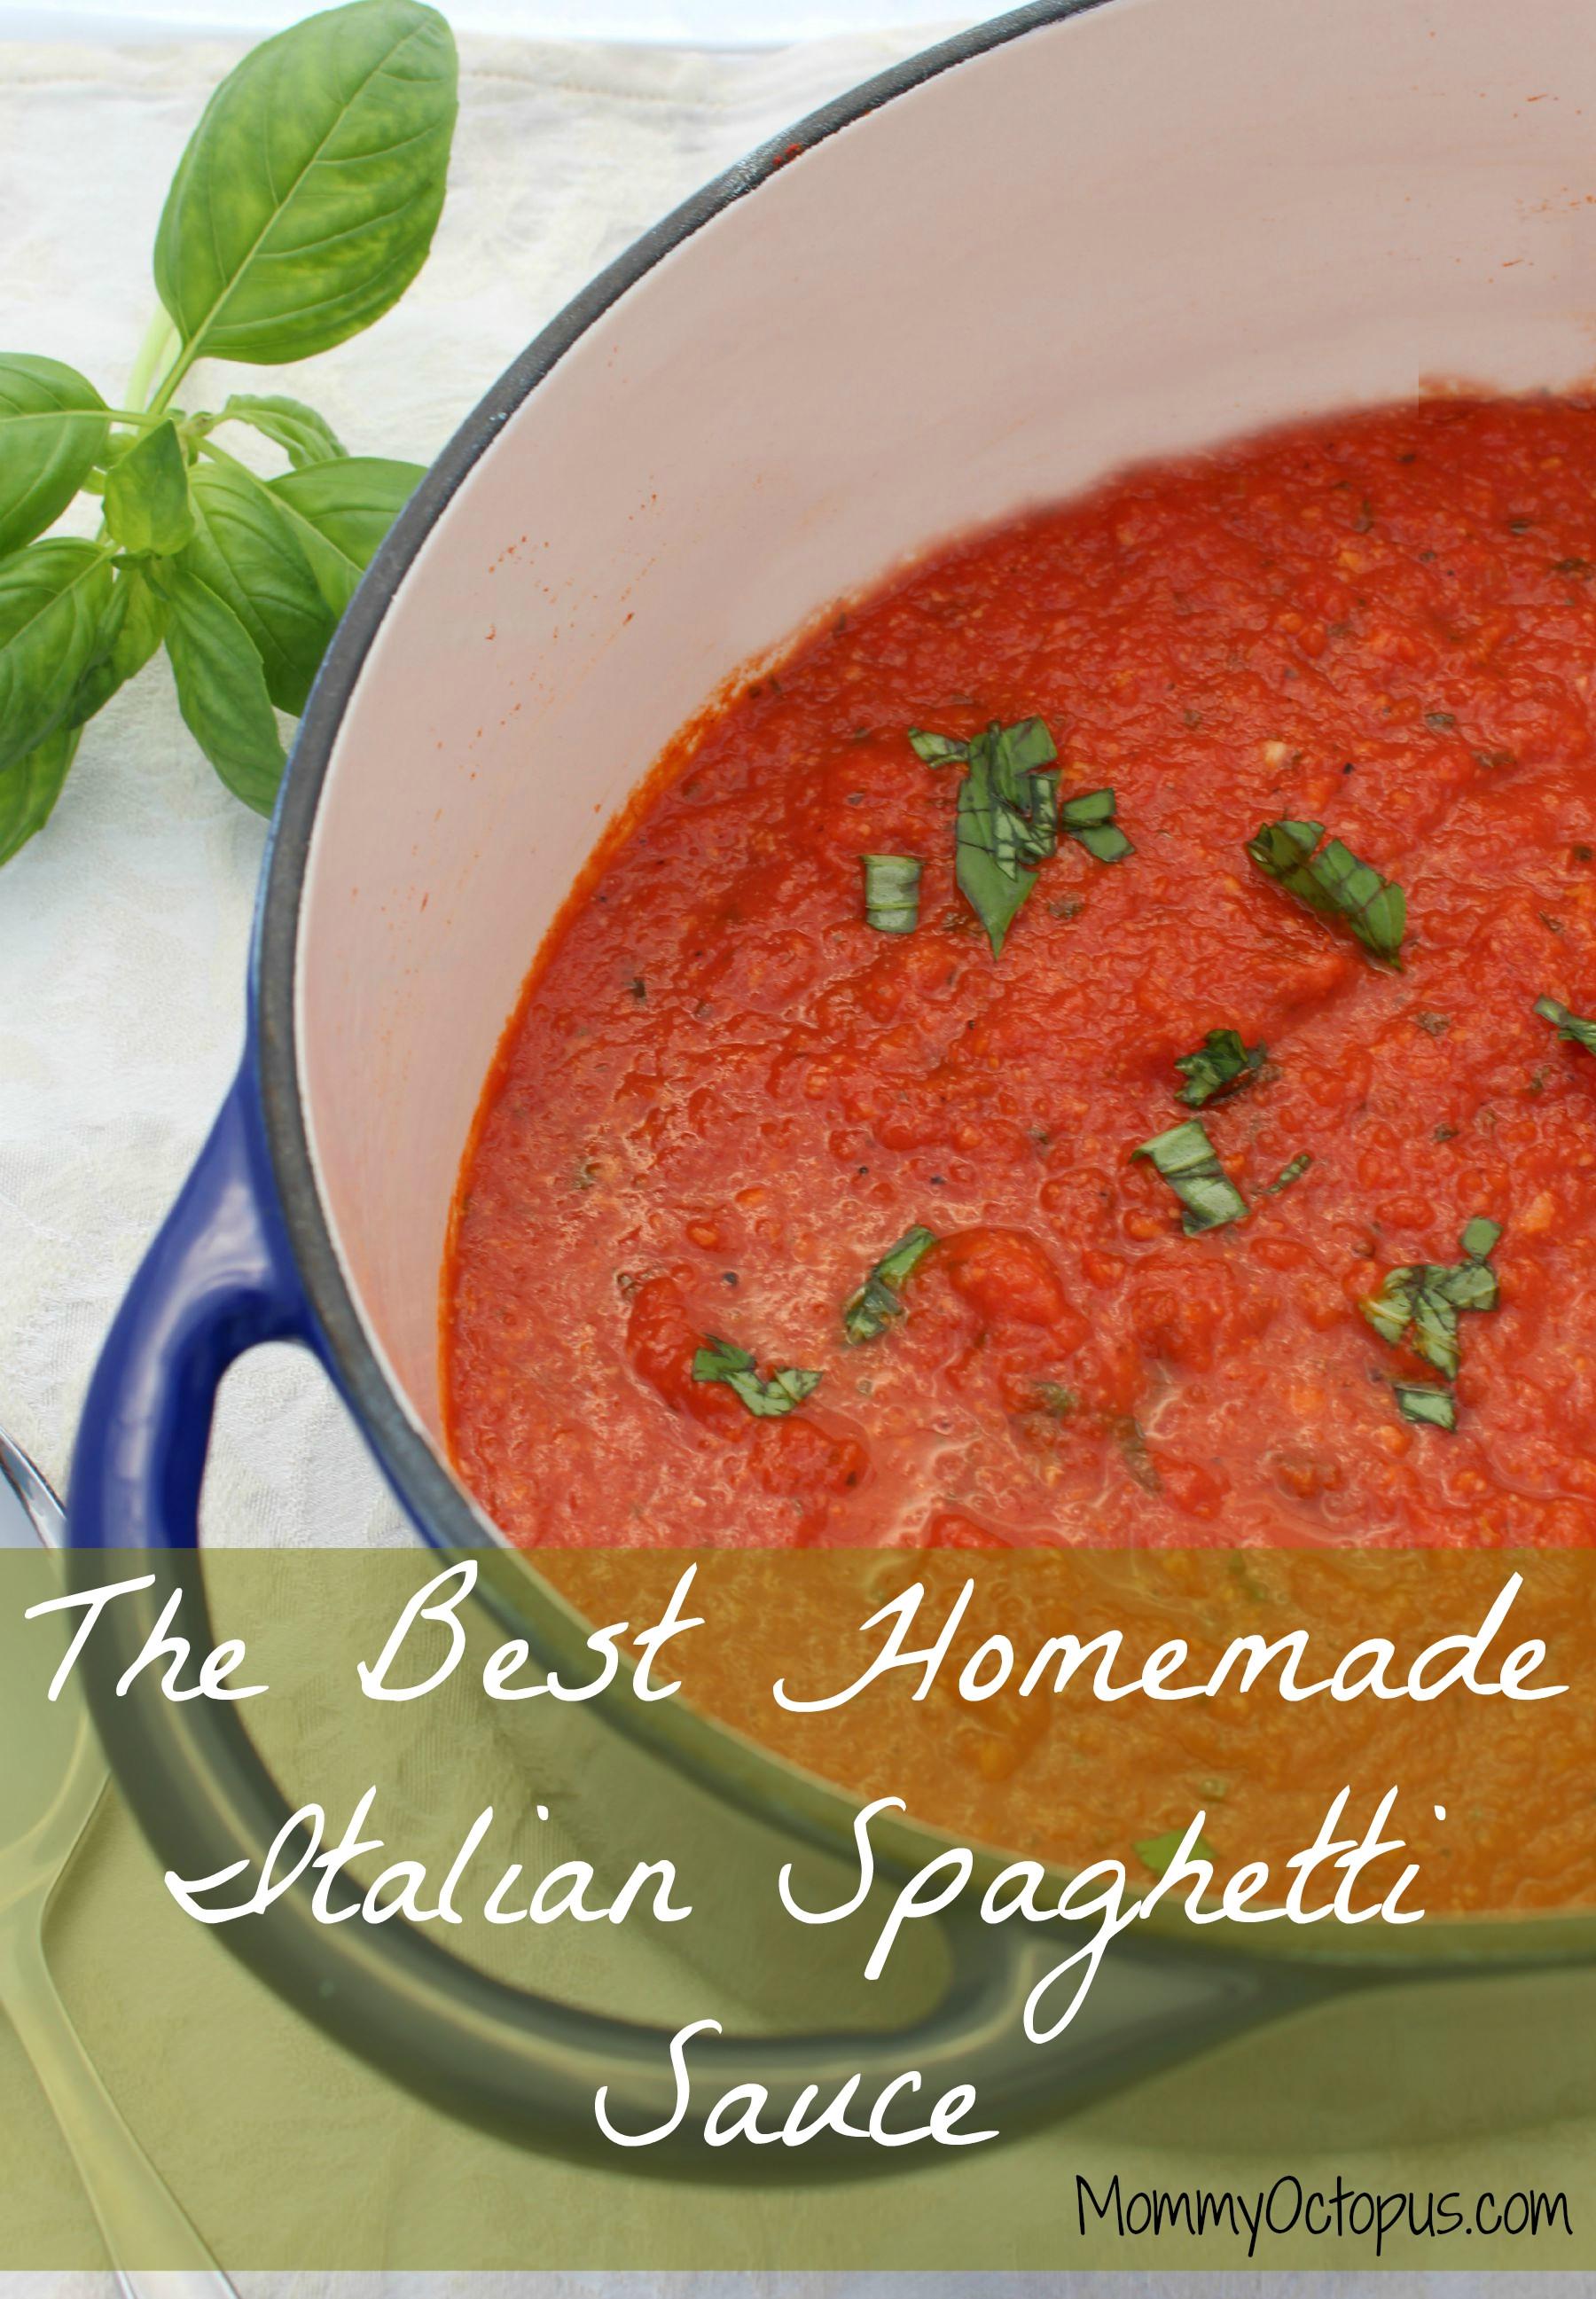 Best Homemade Spaghetti Sauce  The Best Homemade Italian Spaghetti Sauce Mommy Octopus